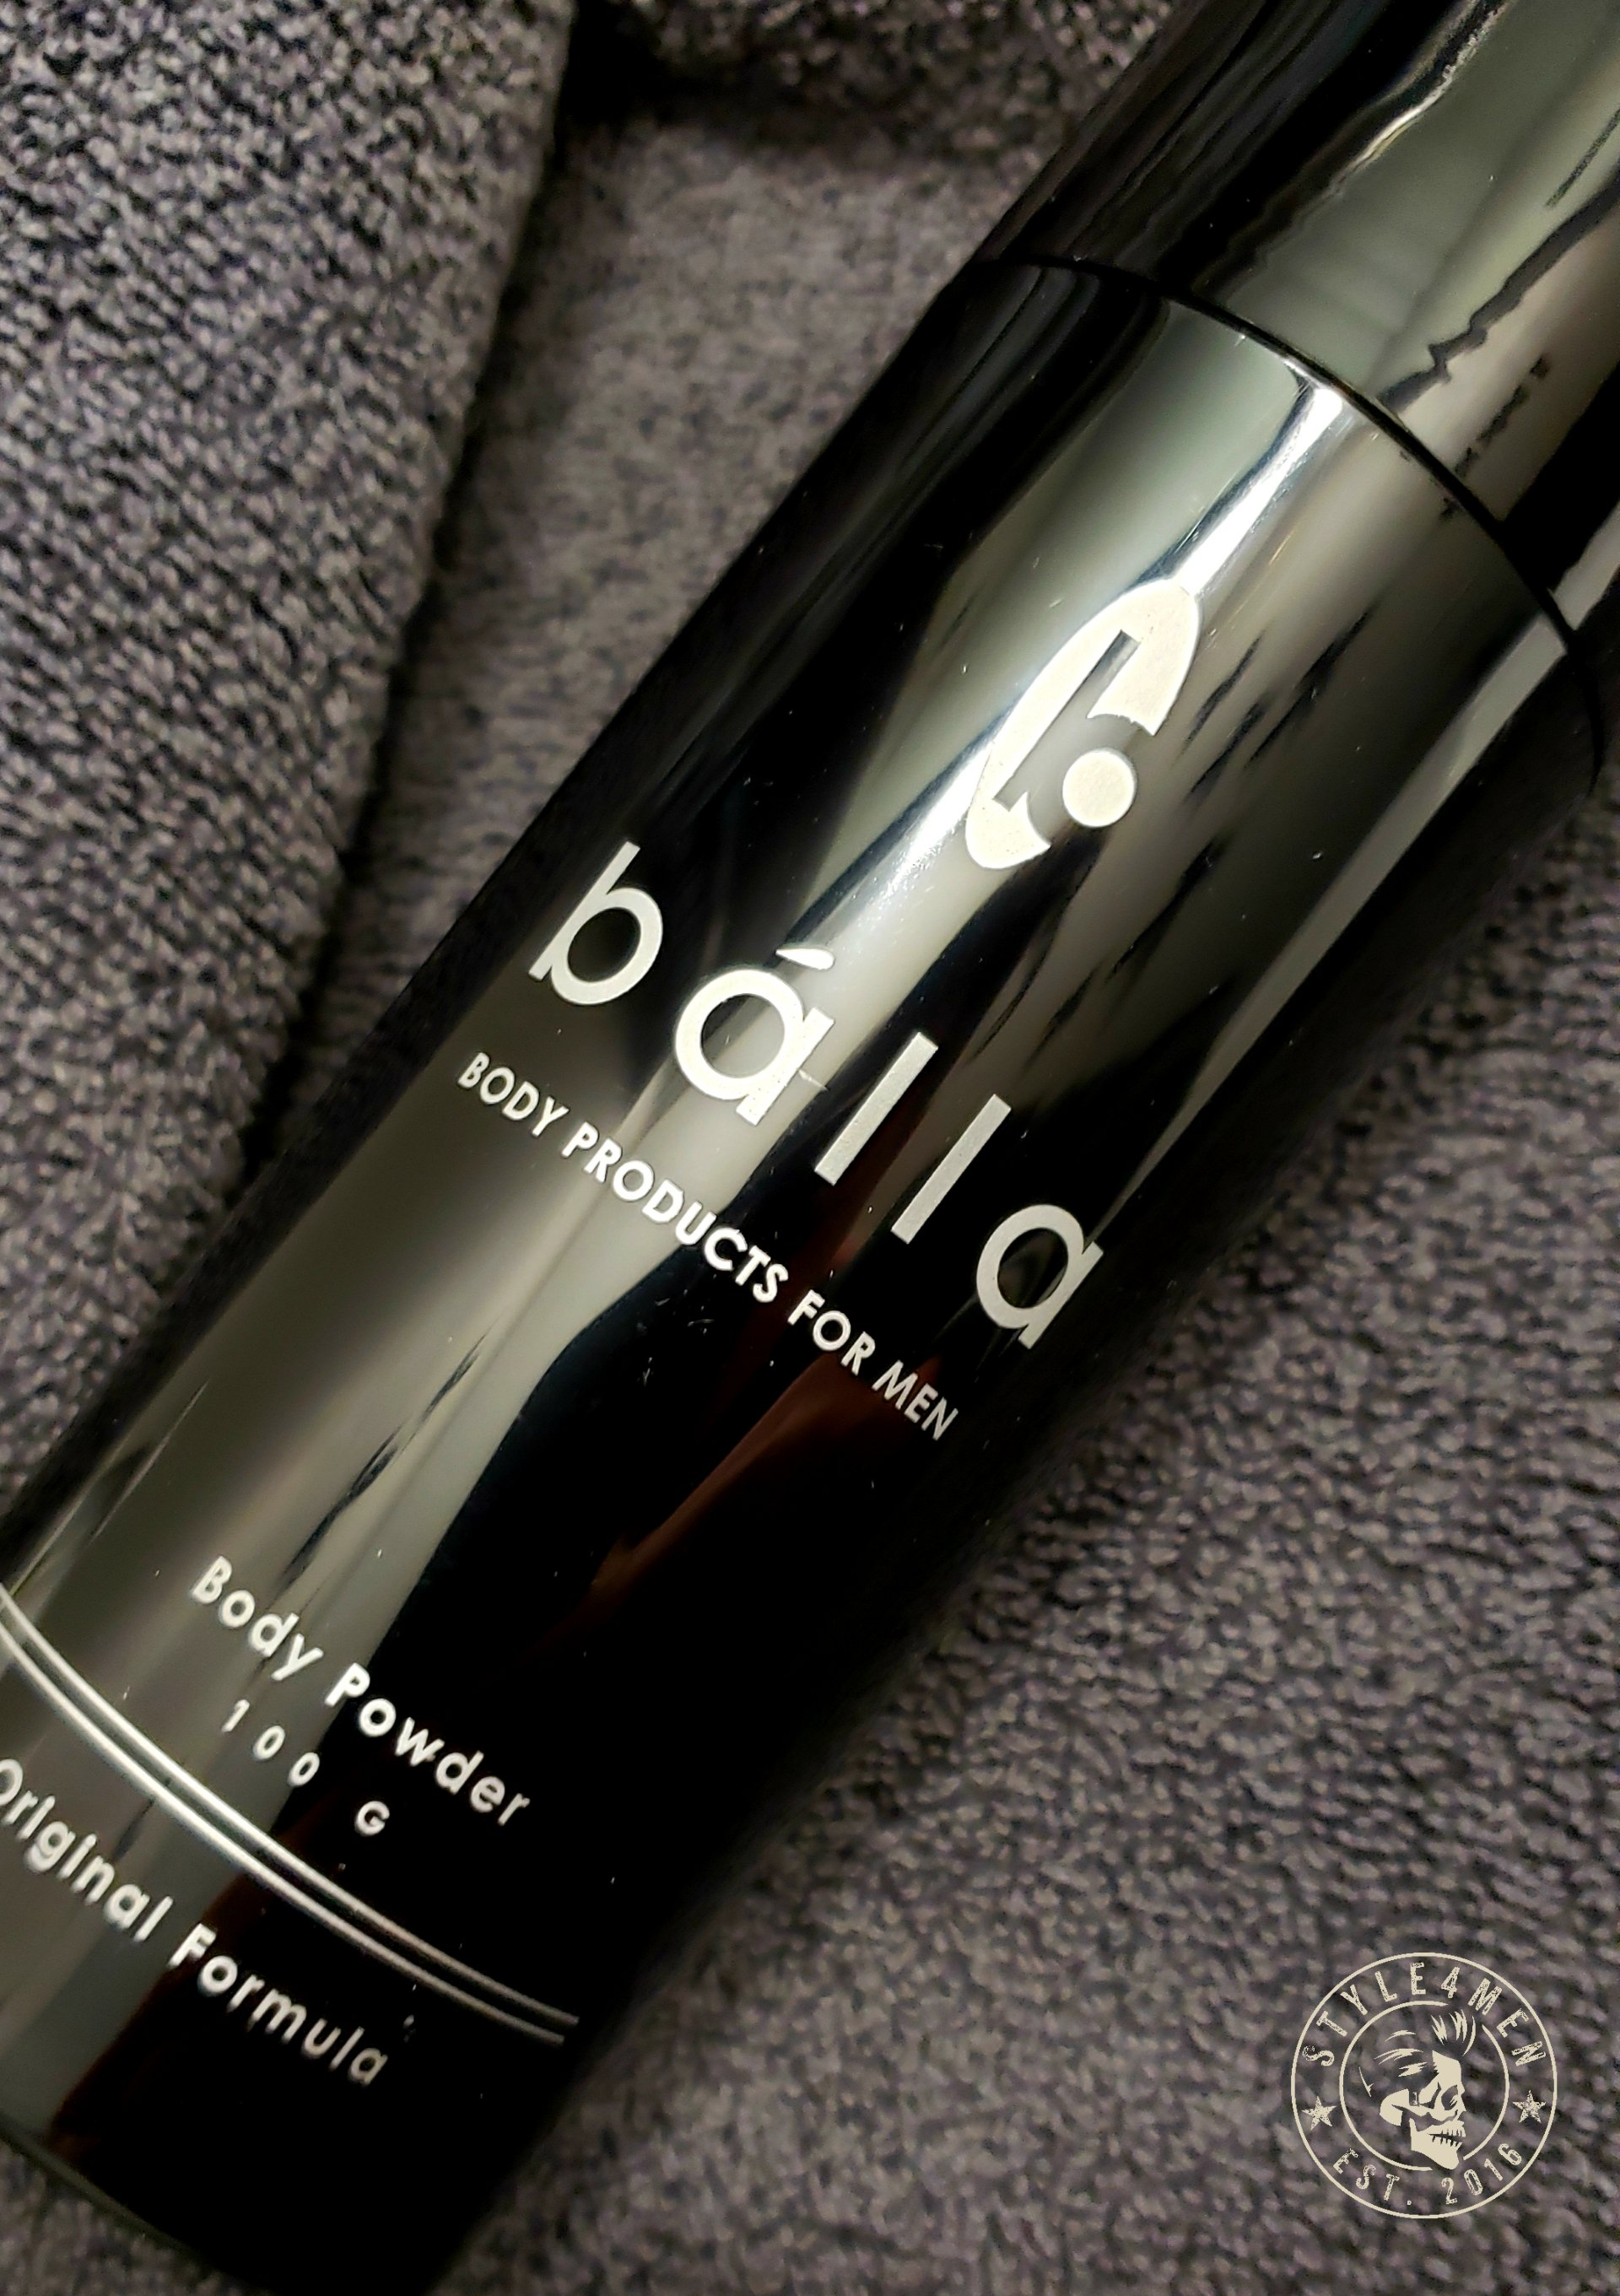 Classic Body Powders by Balla for Men